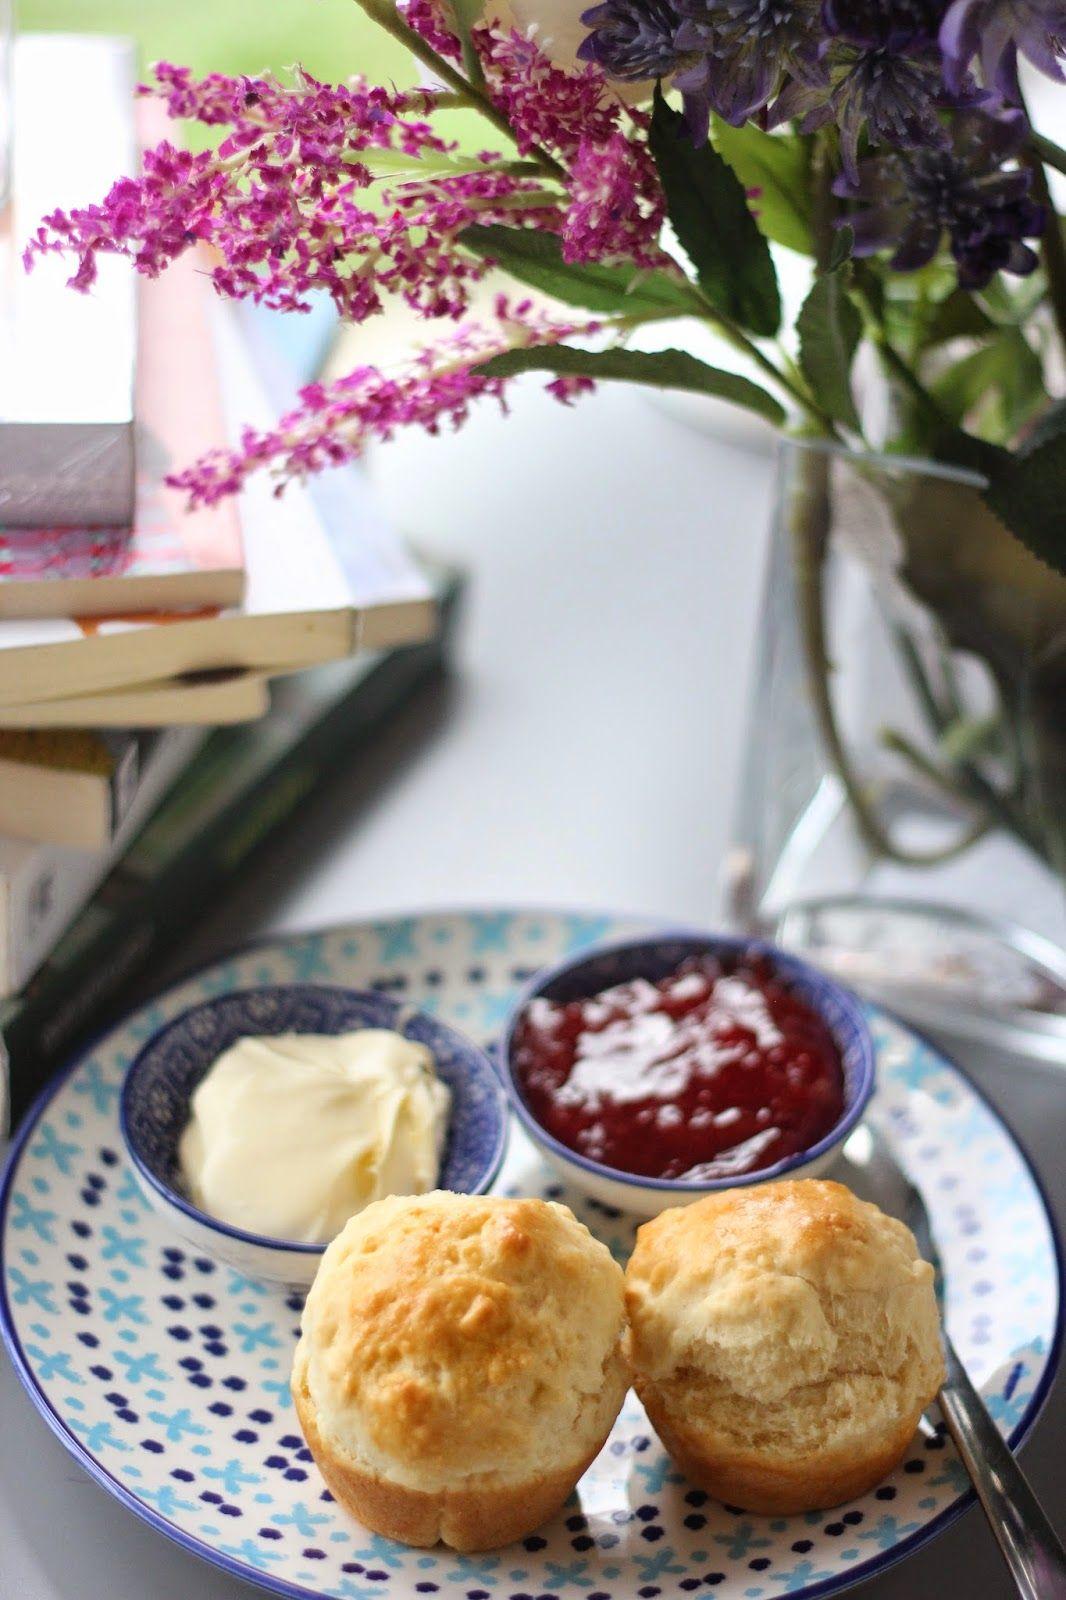 Memokitchen طريقة عمل سكونز الكعكة الشعبية في بريطانيا Scones Food Desserts Cheese